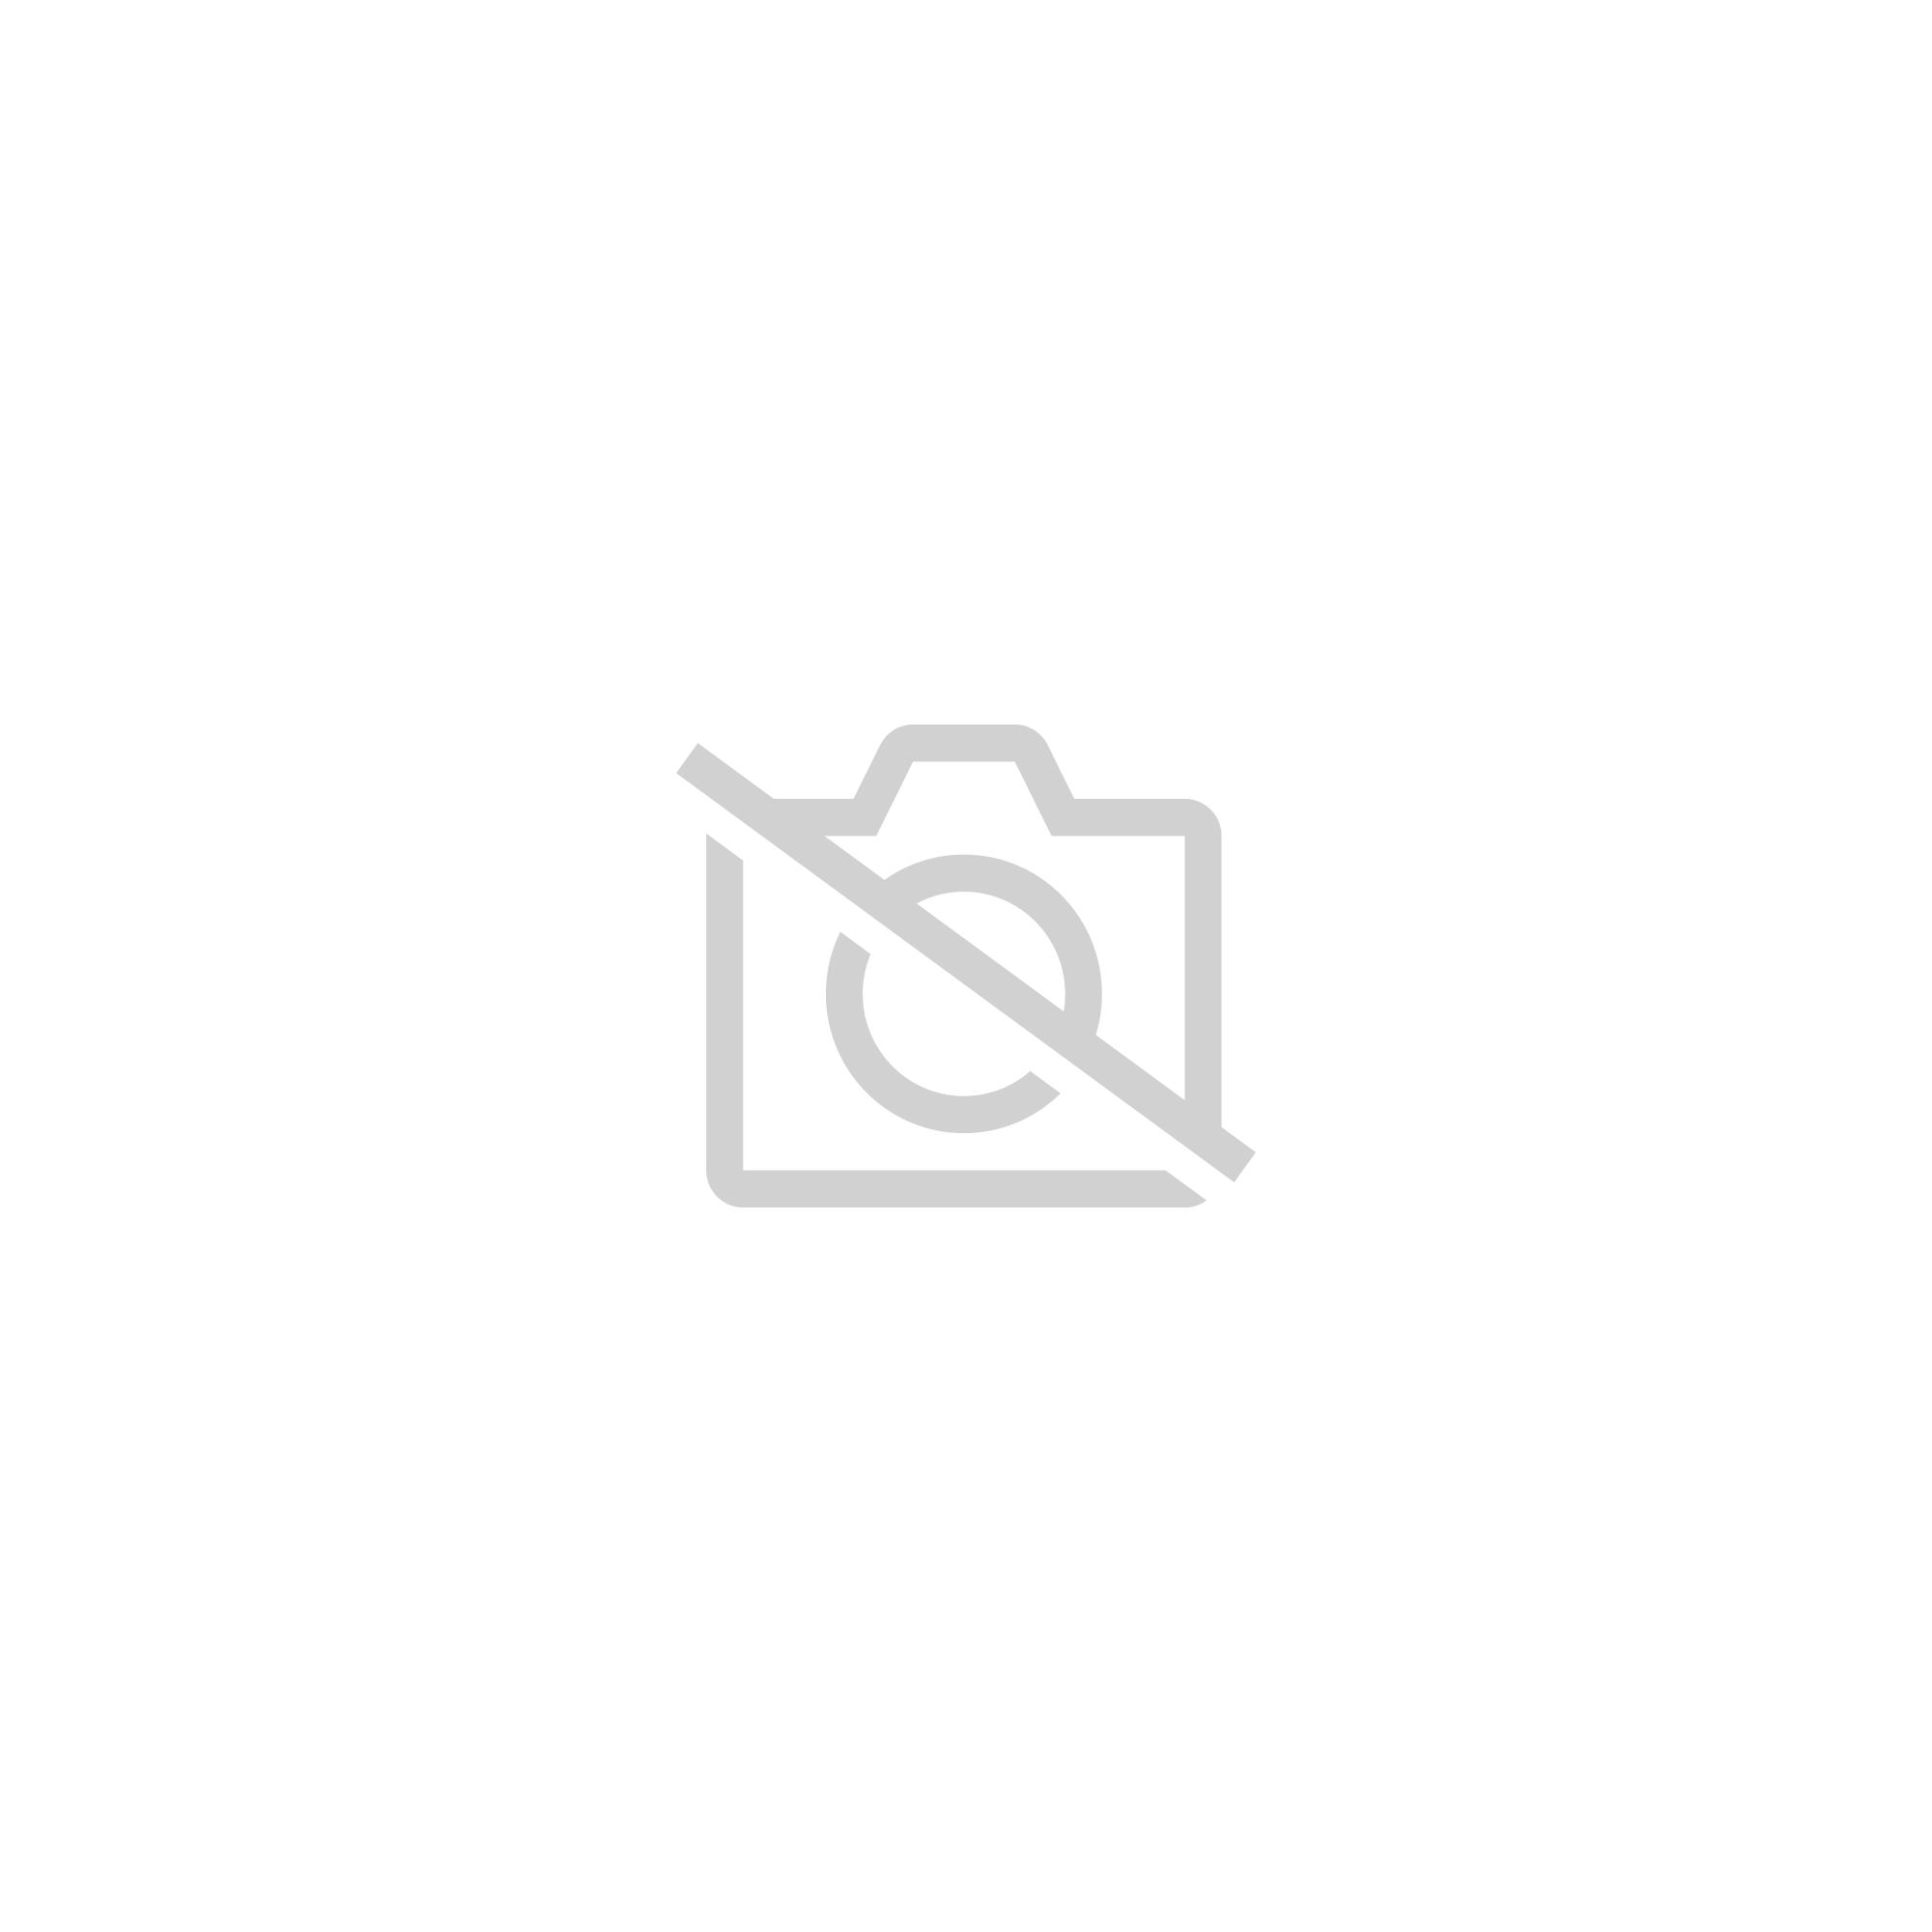 Petite annonce Ampli Roland Cube Monitor Cm-30 - 63000 CLERMONT-FERRAND